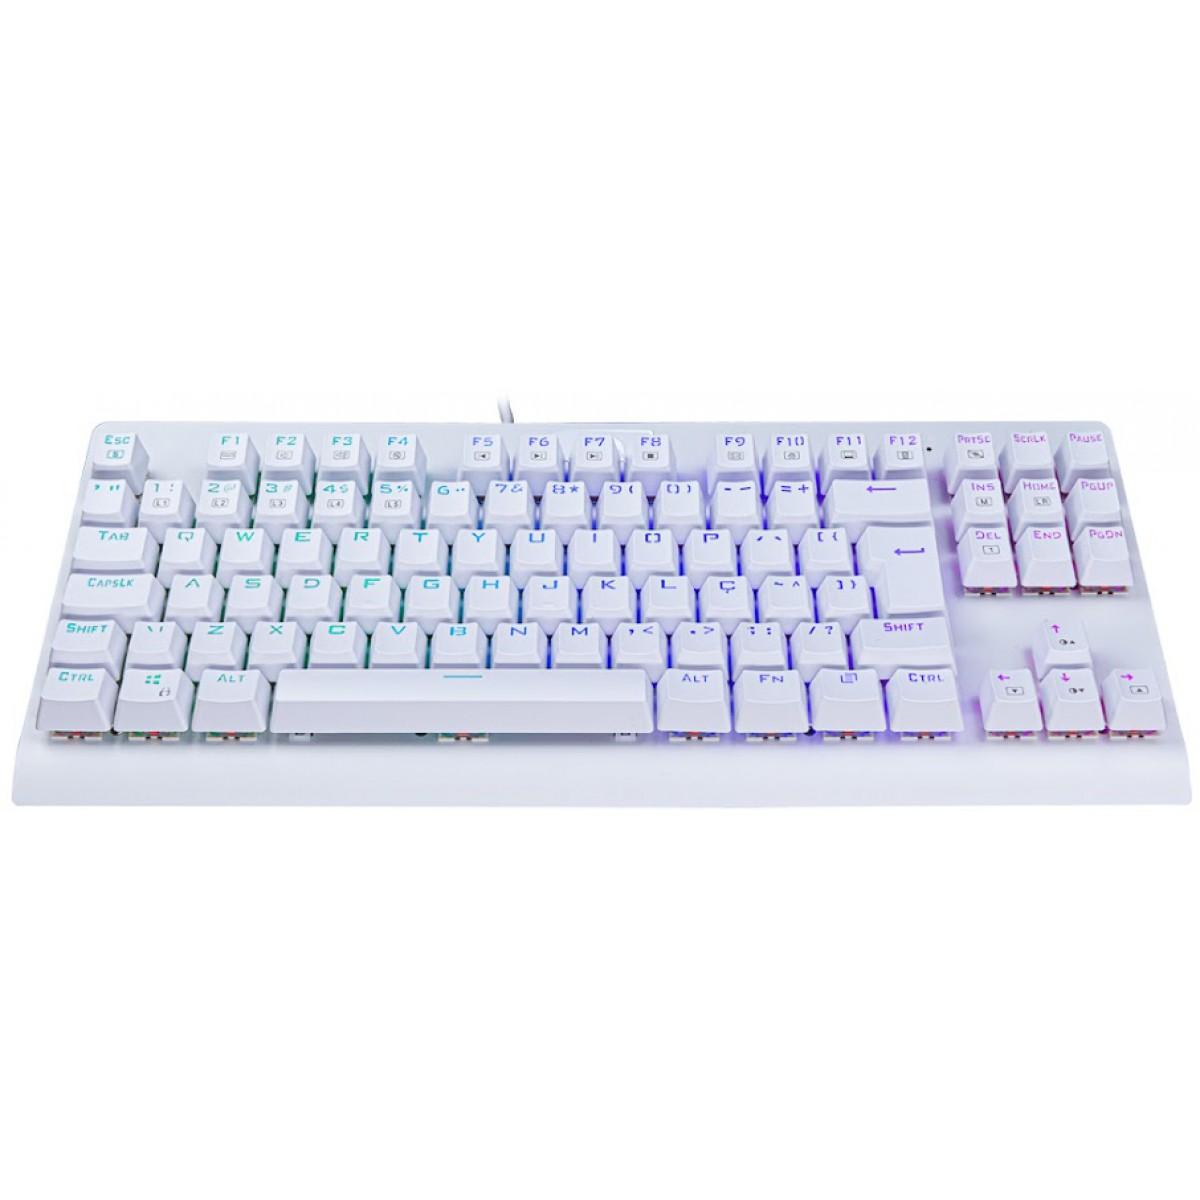 Teclado Mecânico Gamer Redragon Dark Avenger Lunar K568 RGB, Switch Blue, ABNT2, White